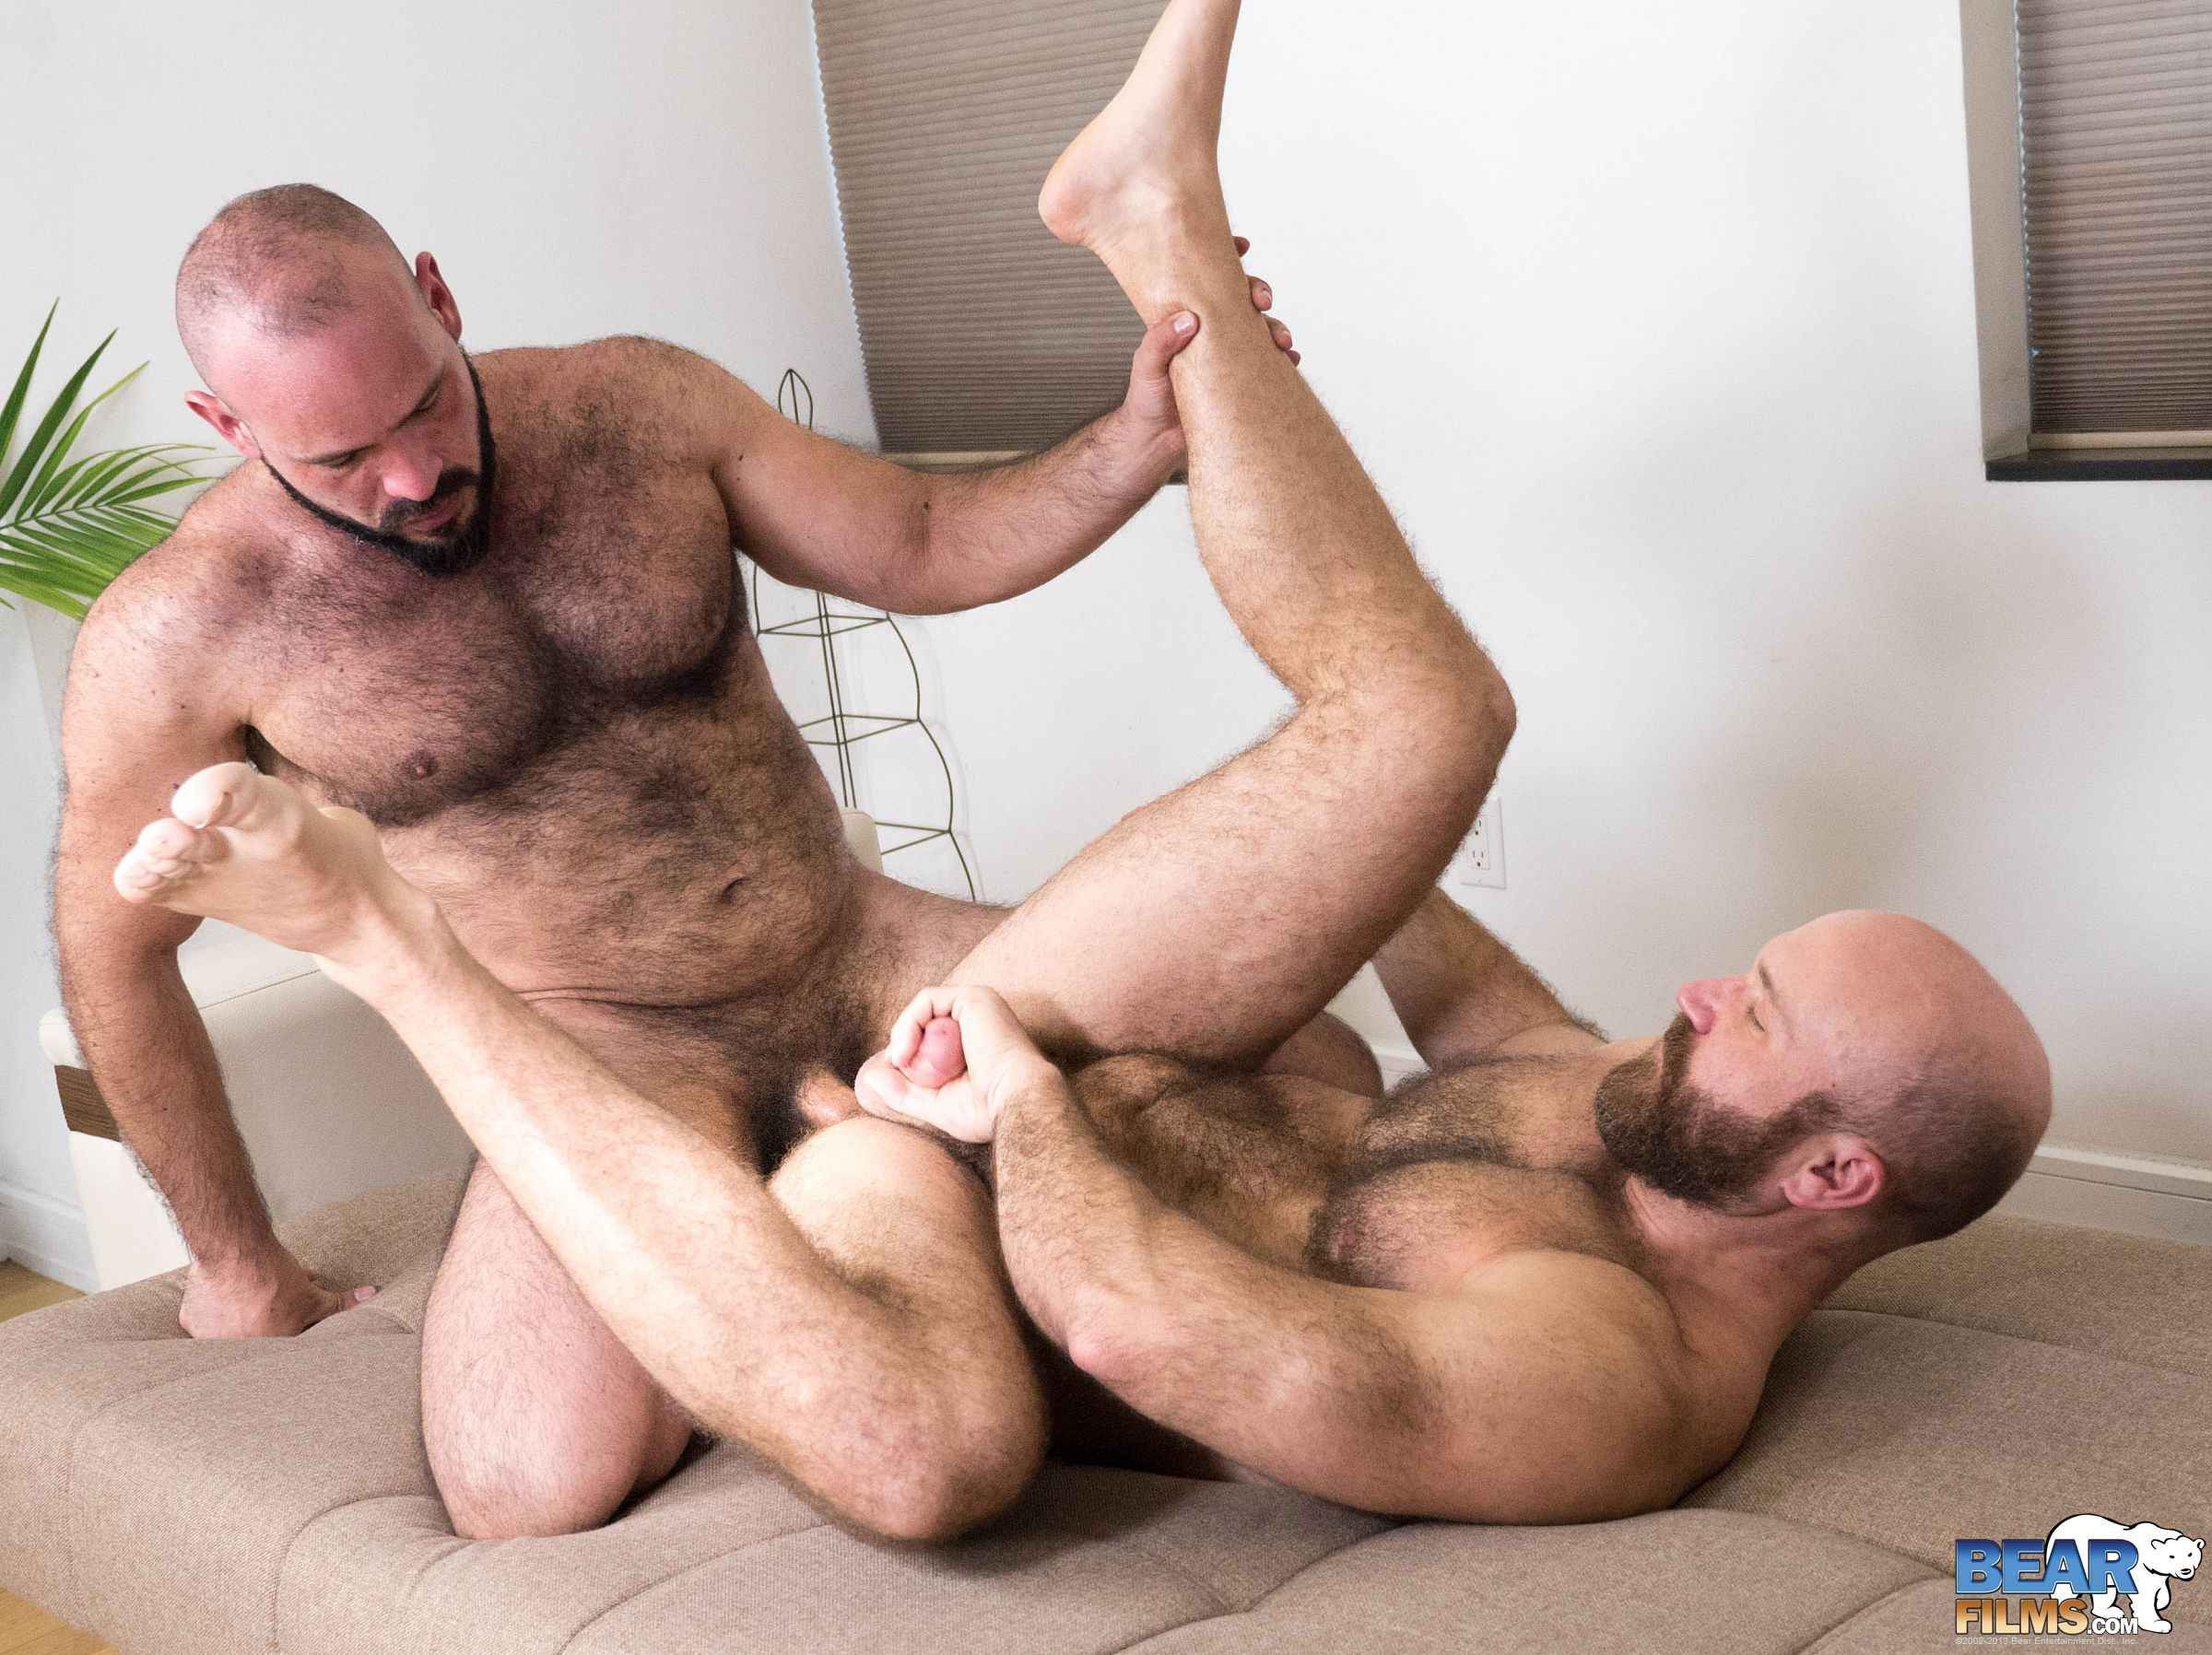 Nixon steele porno gay Bear Films Nixon Steele And Marco Bolt Gay Porn Video